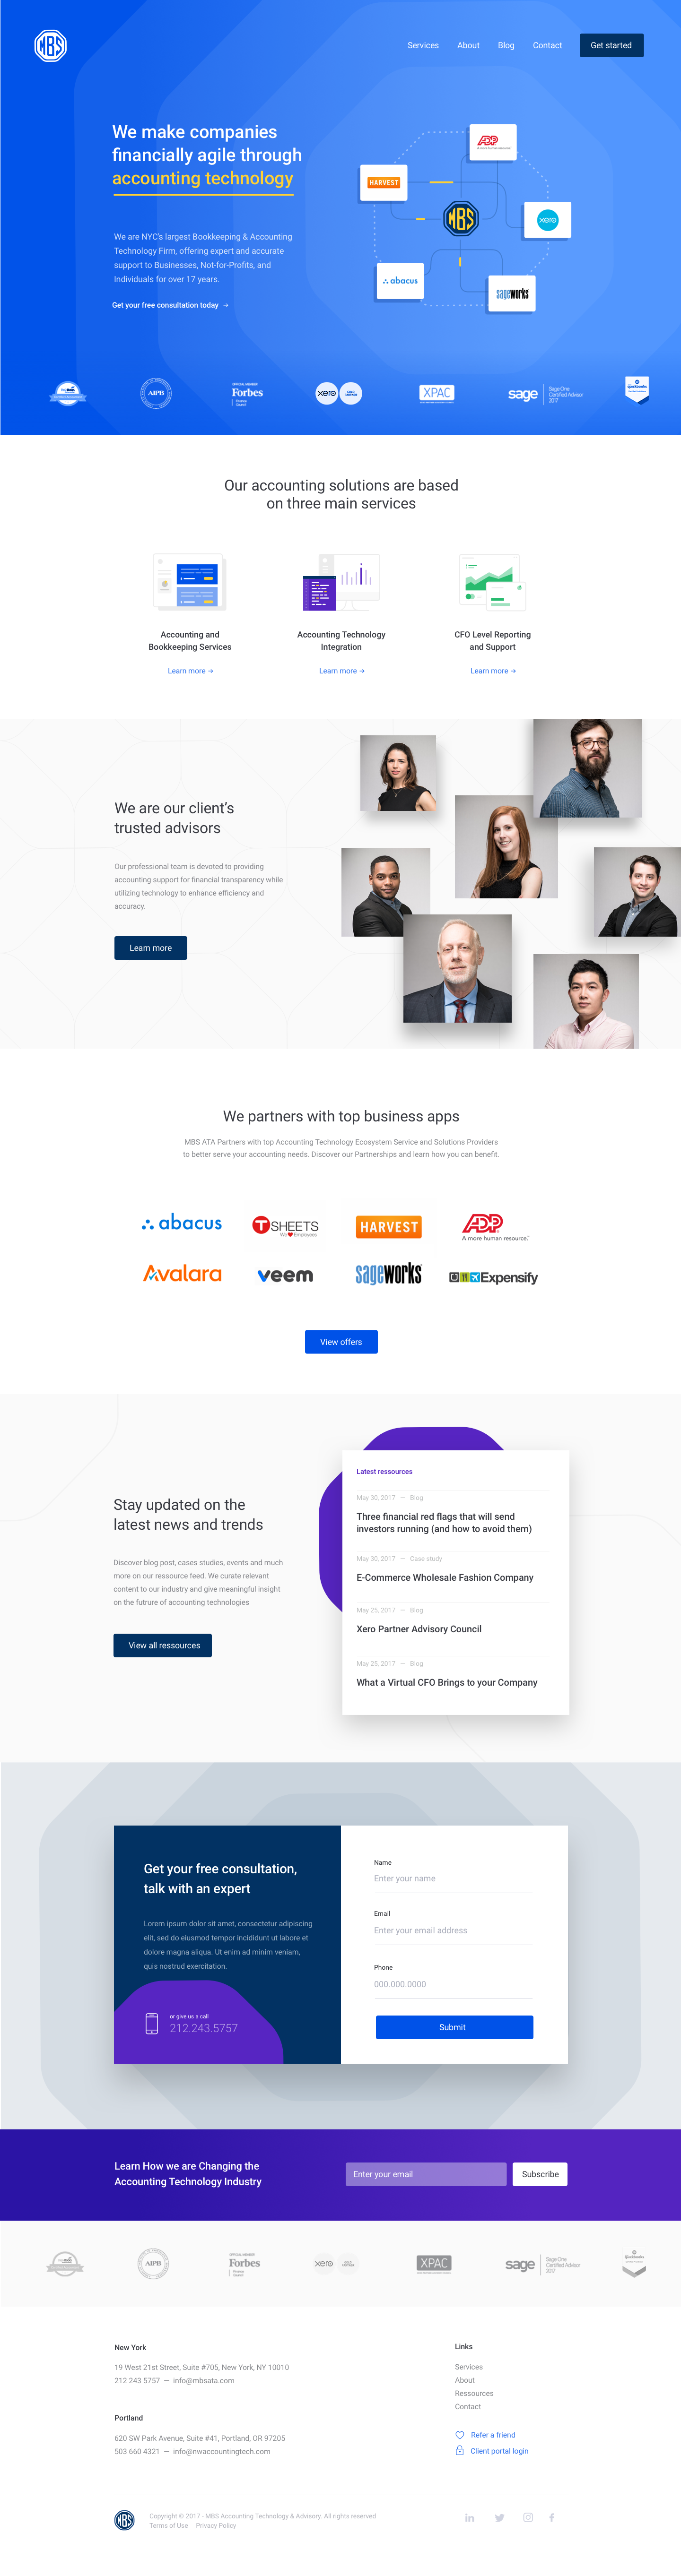 Homepage redesign mockup v2